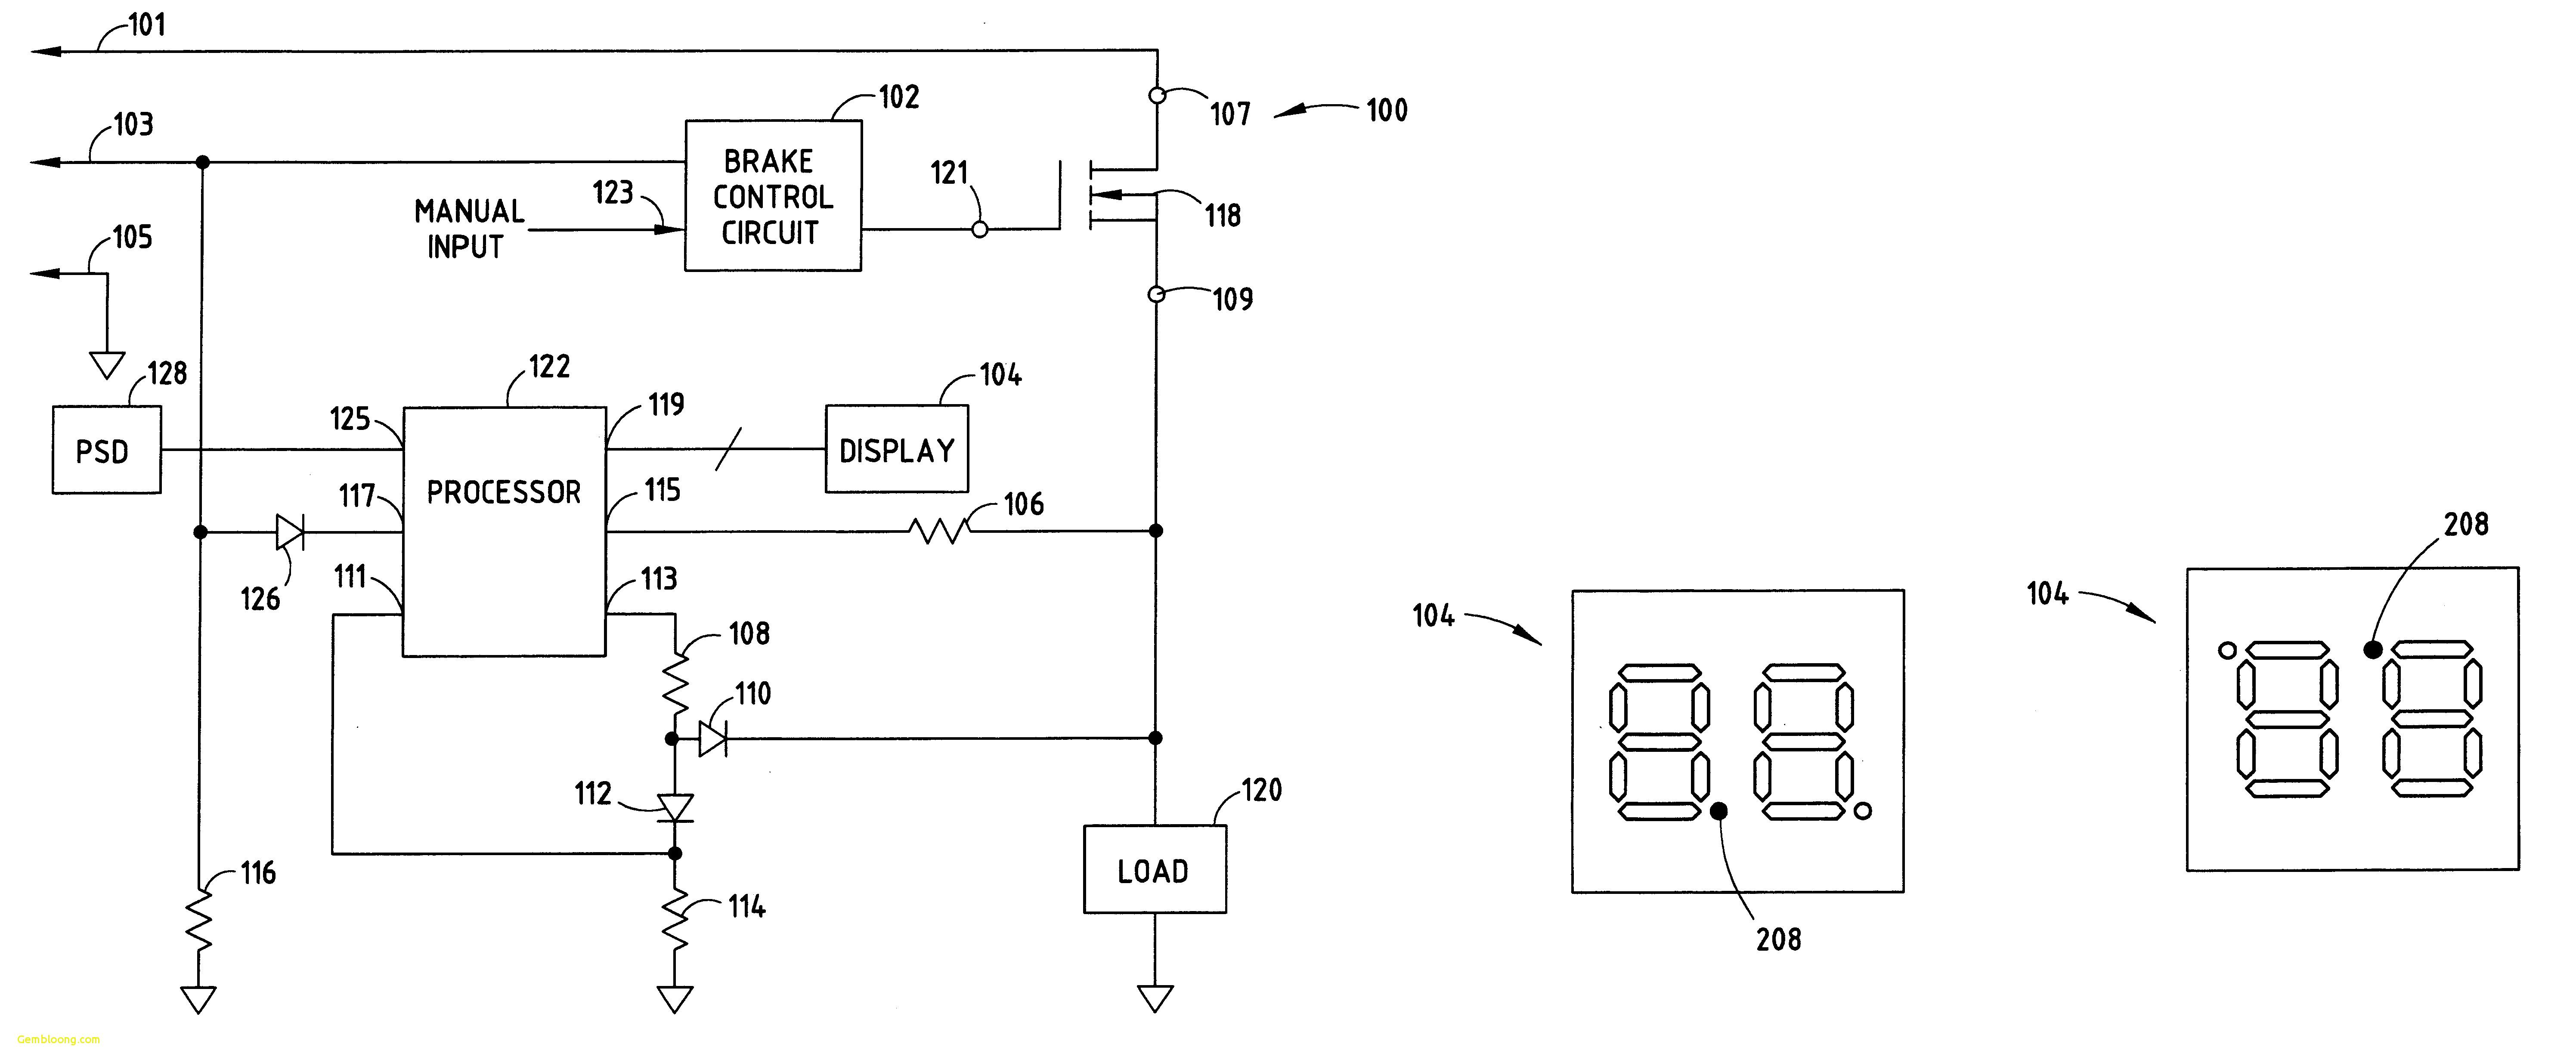 Tekonsha Voyager Electric Ke Wiring Diagram | Wiring Diagram - Tekonsha Voyager Wiring Diagram